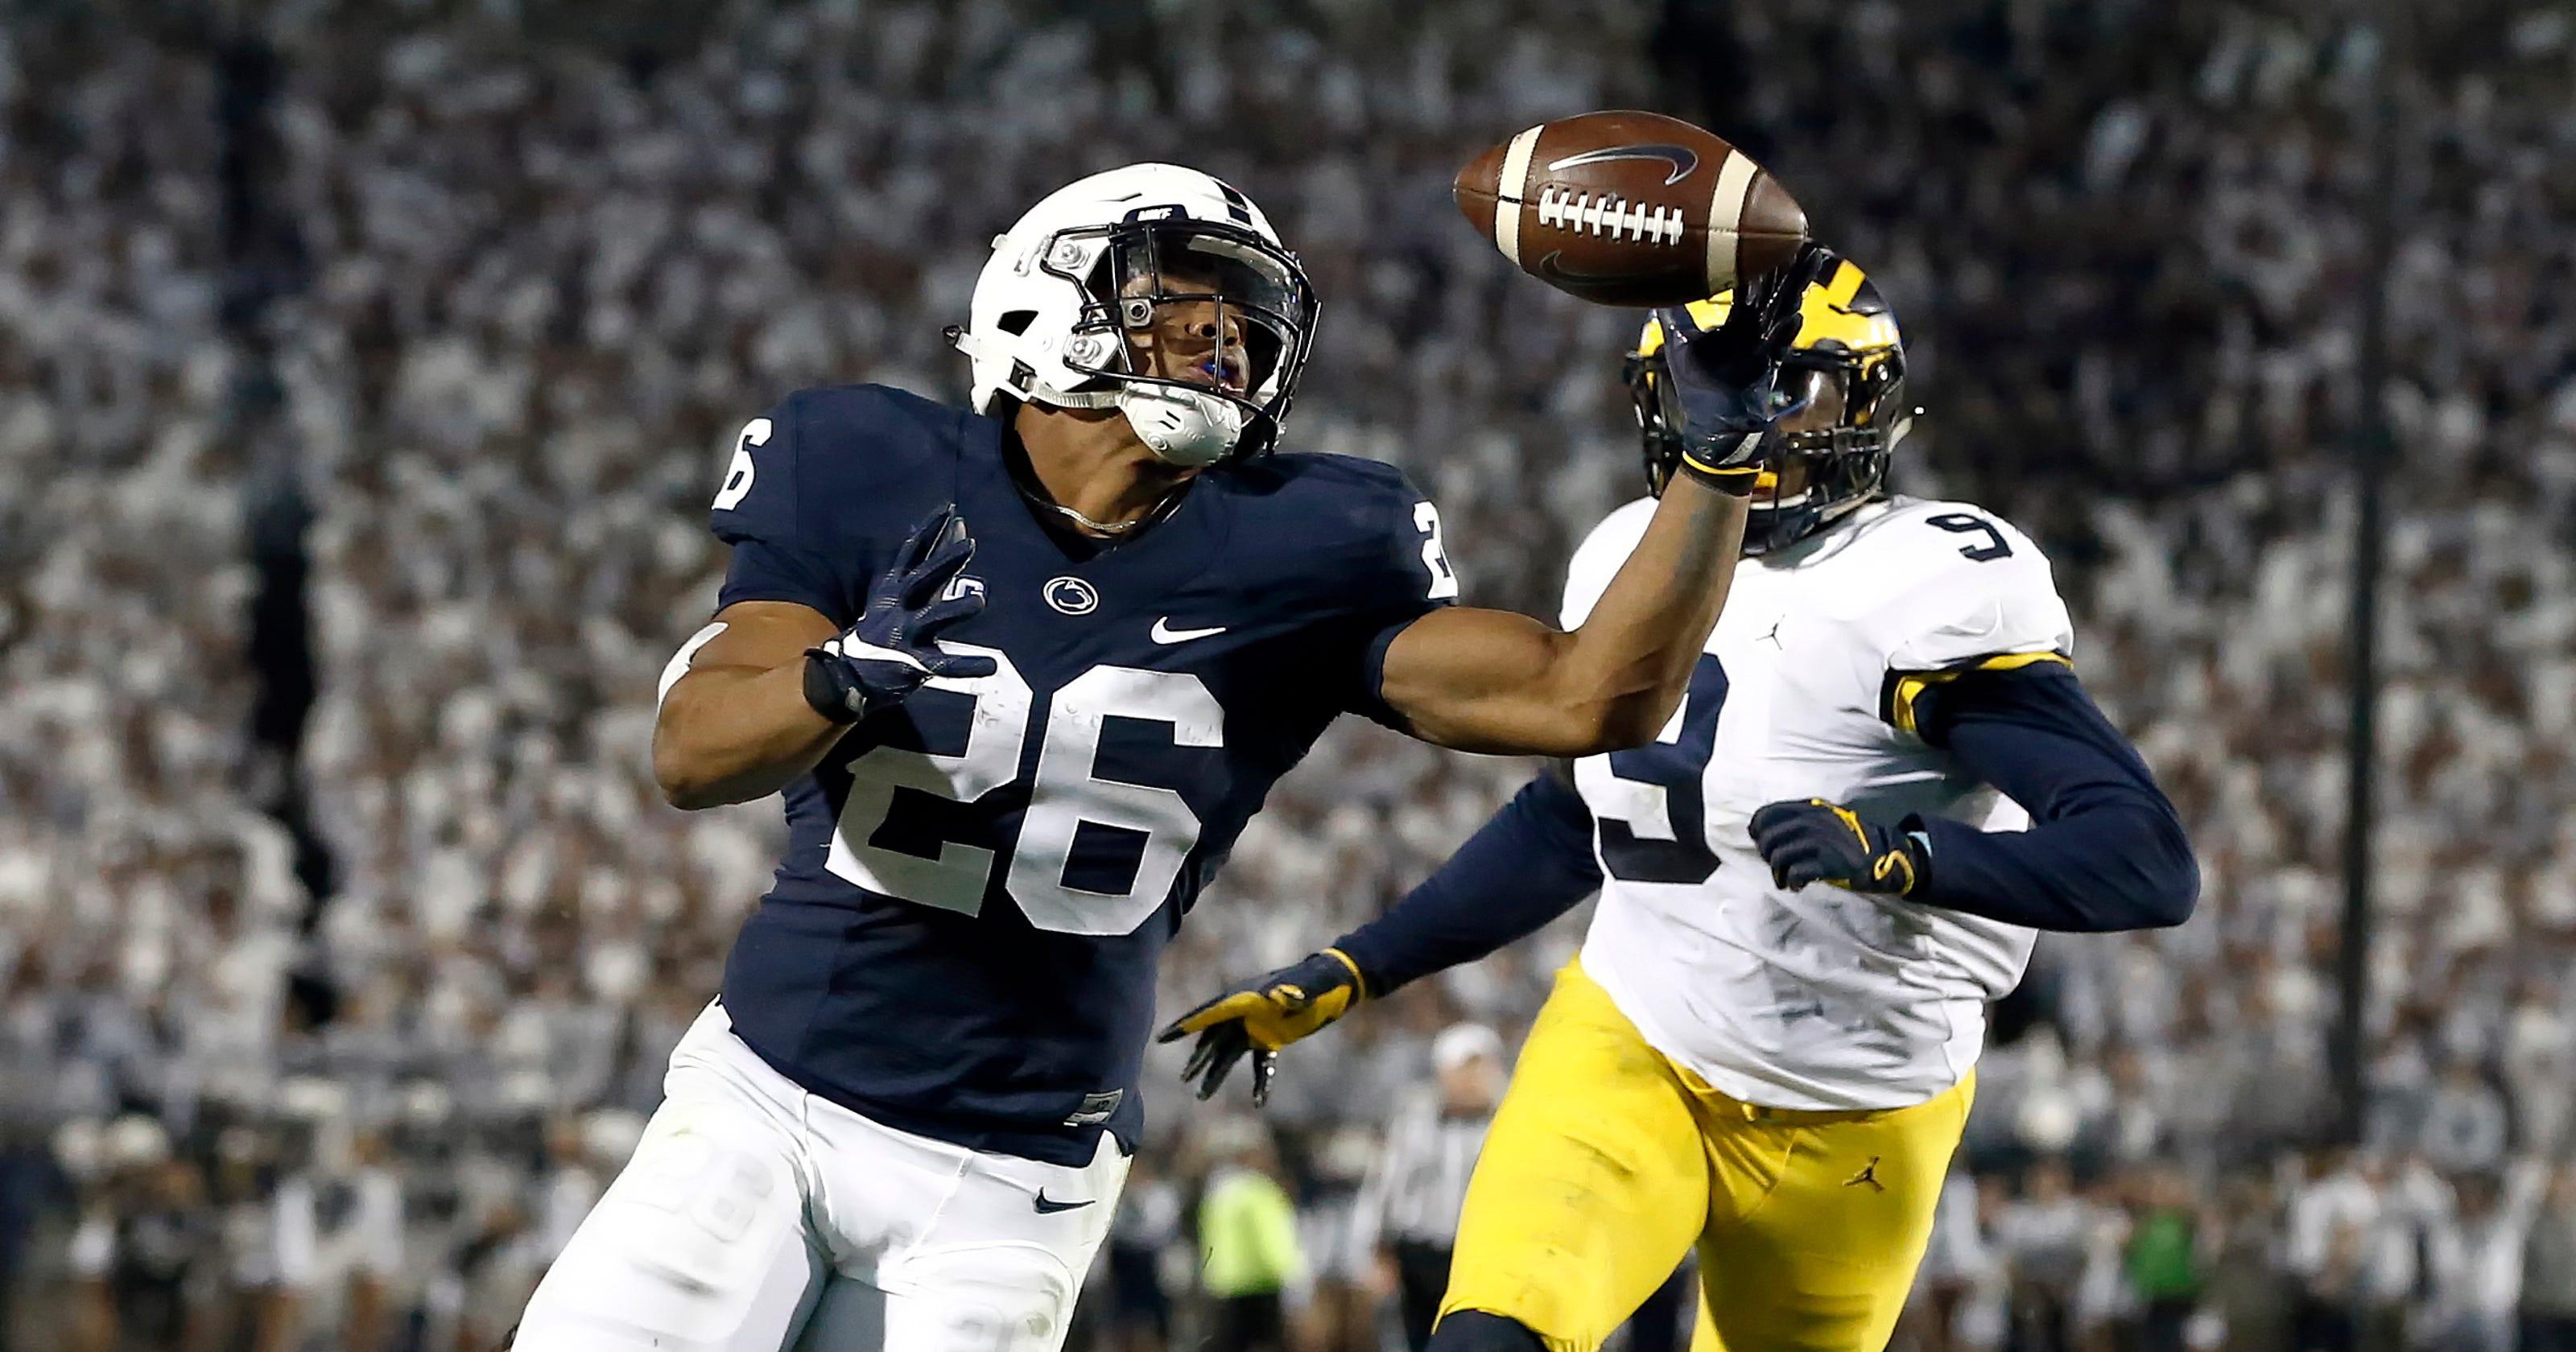 Michigan film study  Penn State s big plays that broke Wolverines ce2823526